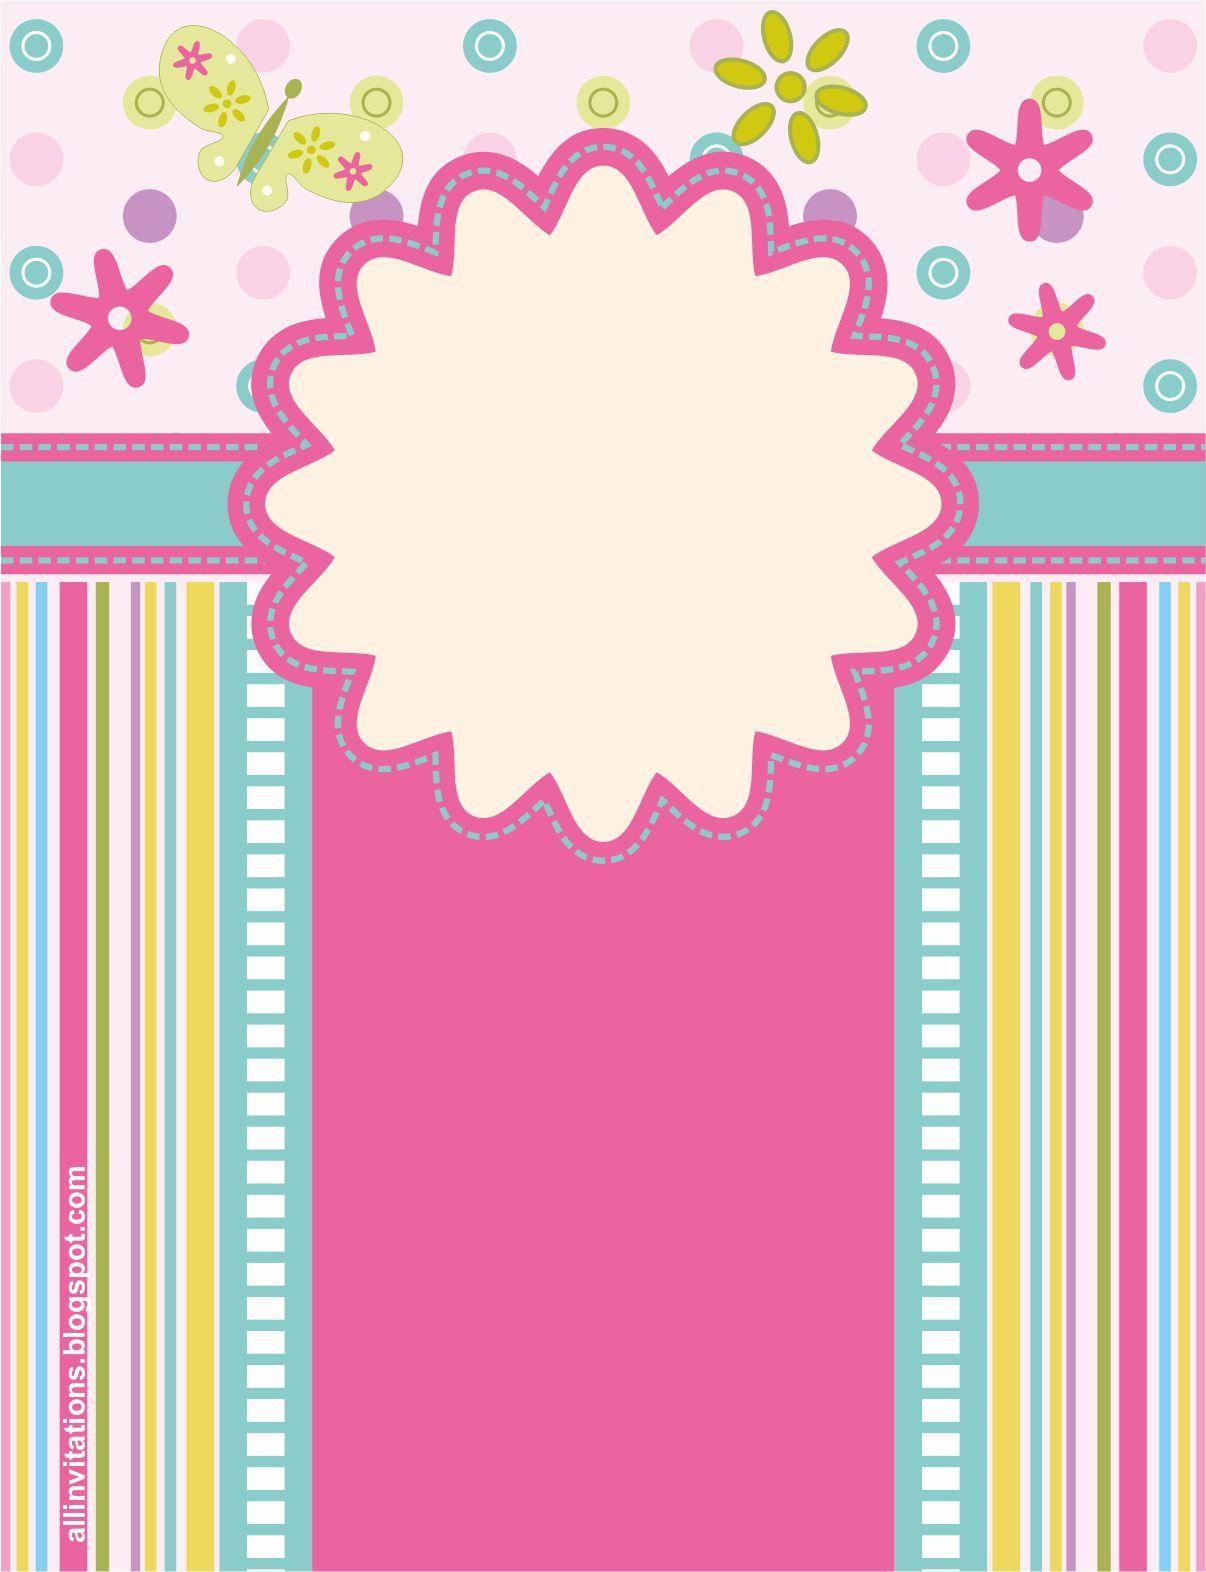 Peppa Pig Invitation was adorable invitation layout